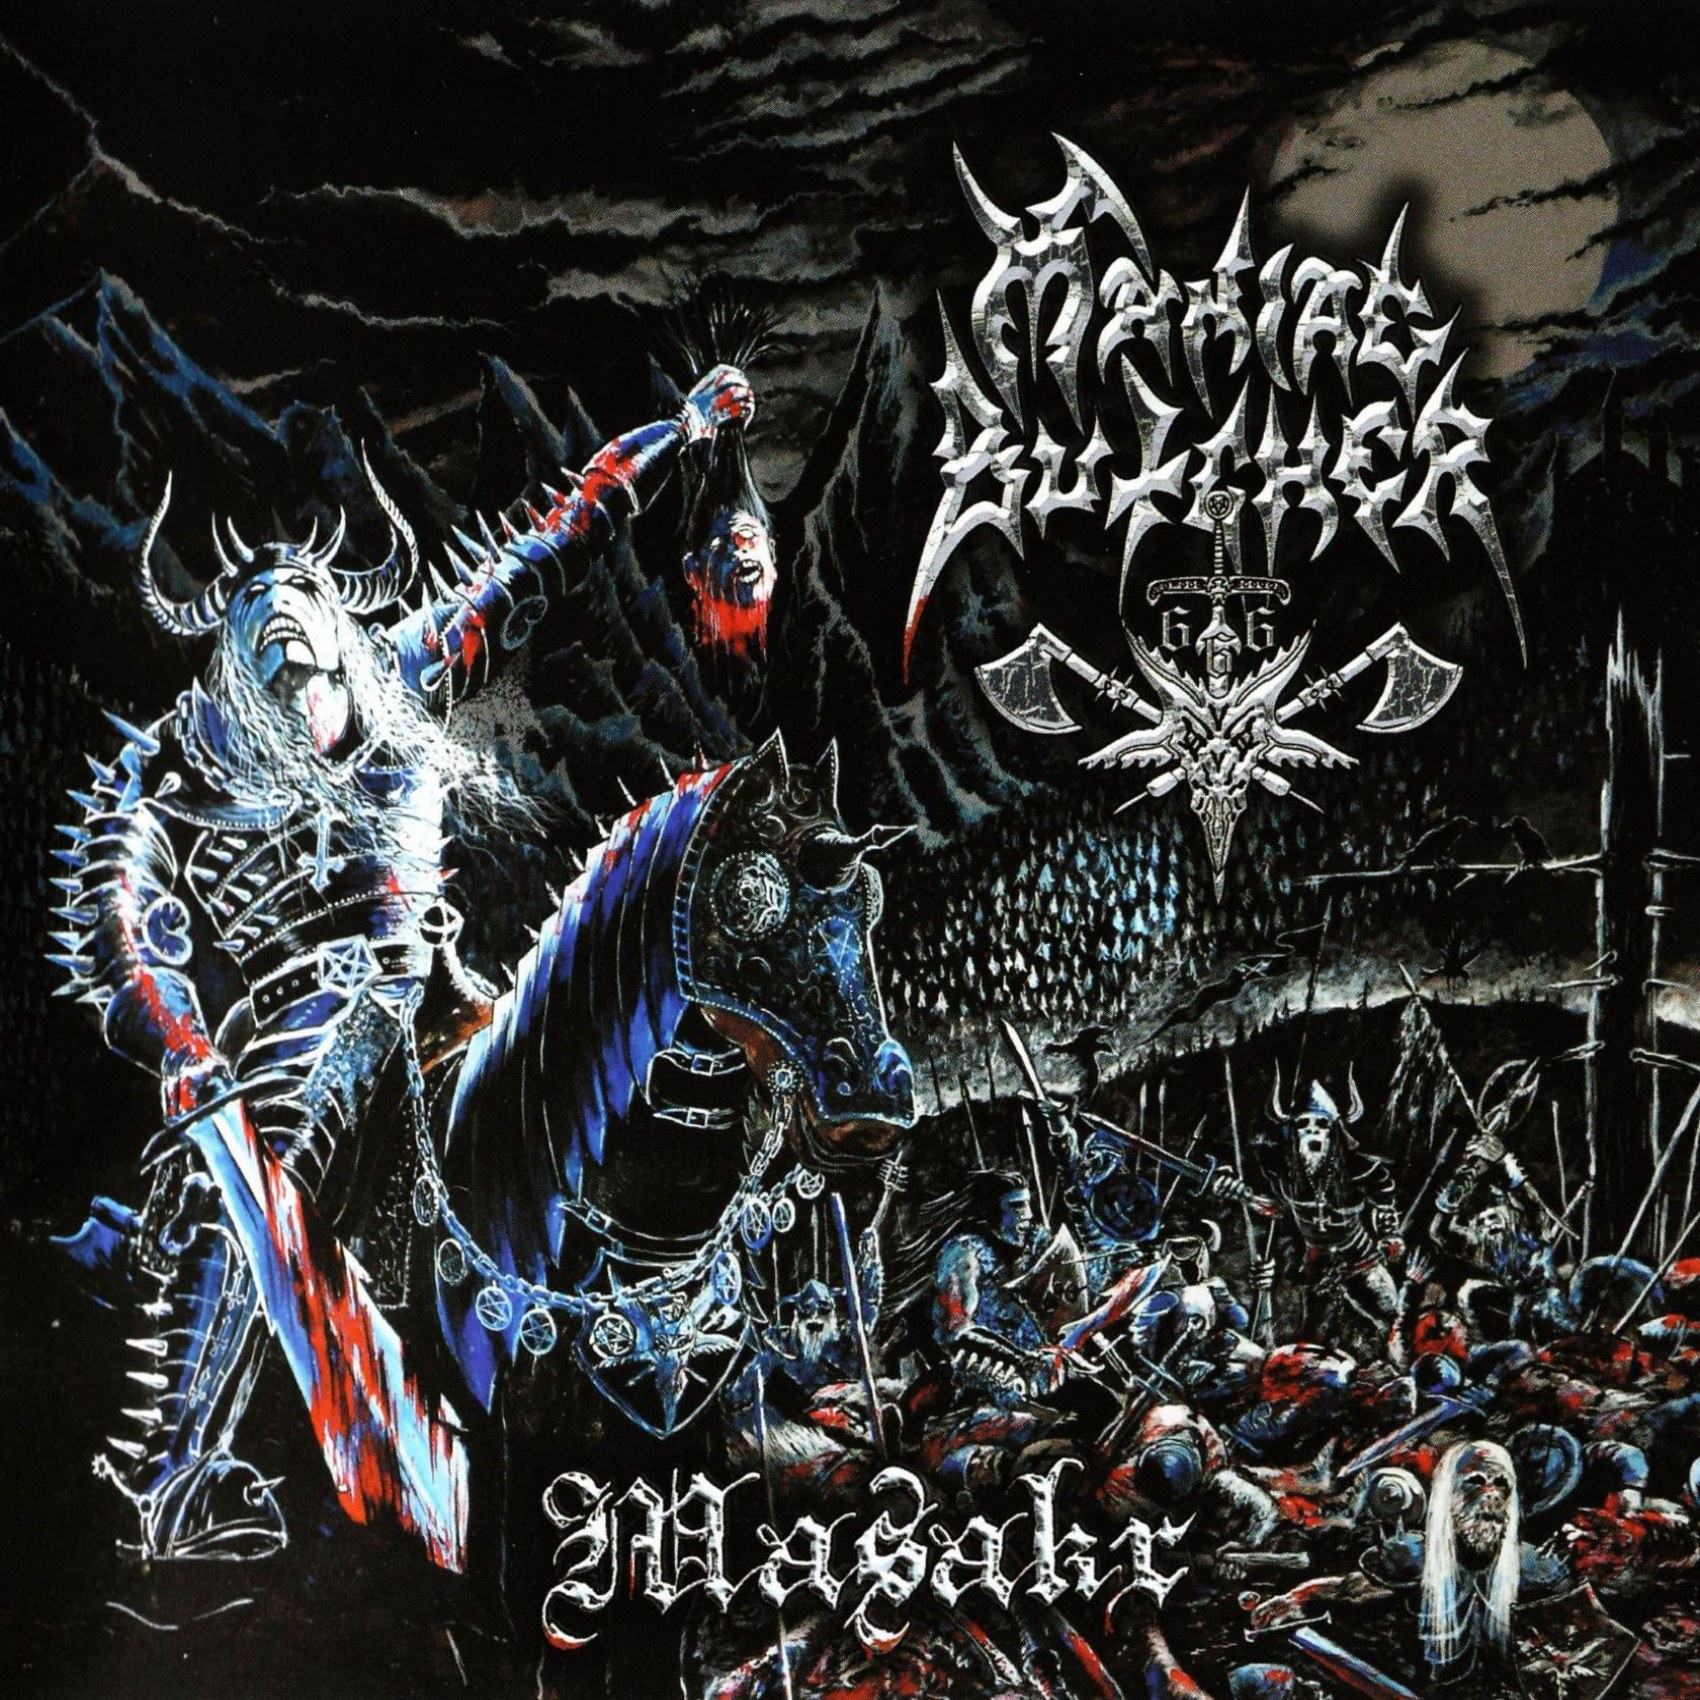 Review for Maniac Butcher - Masakr